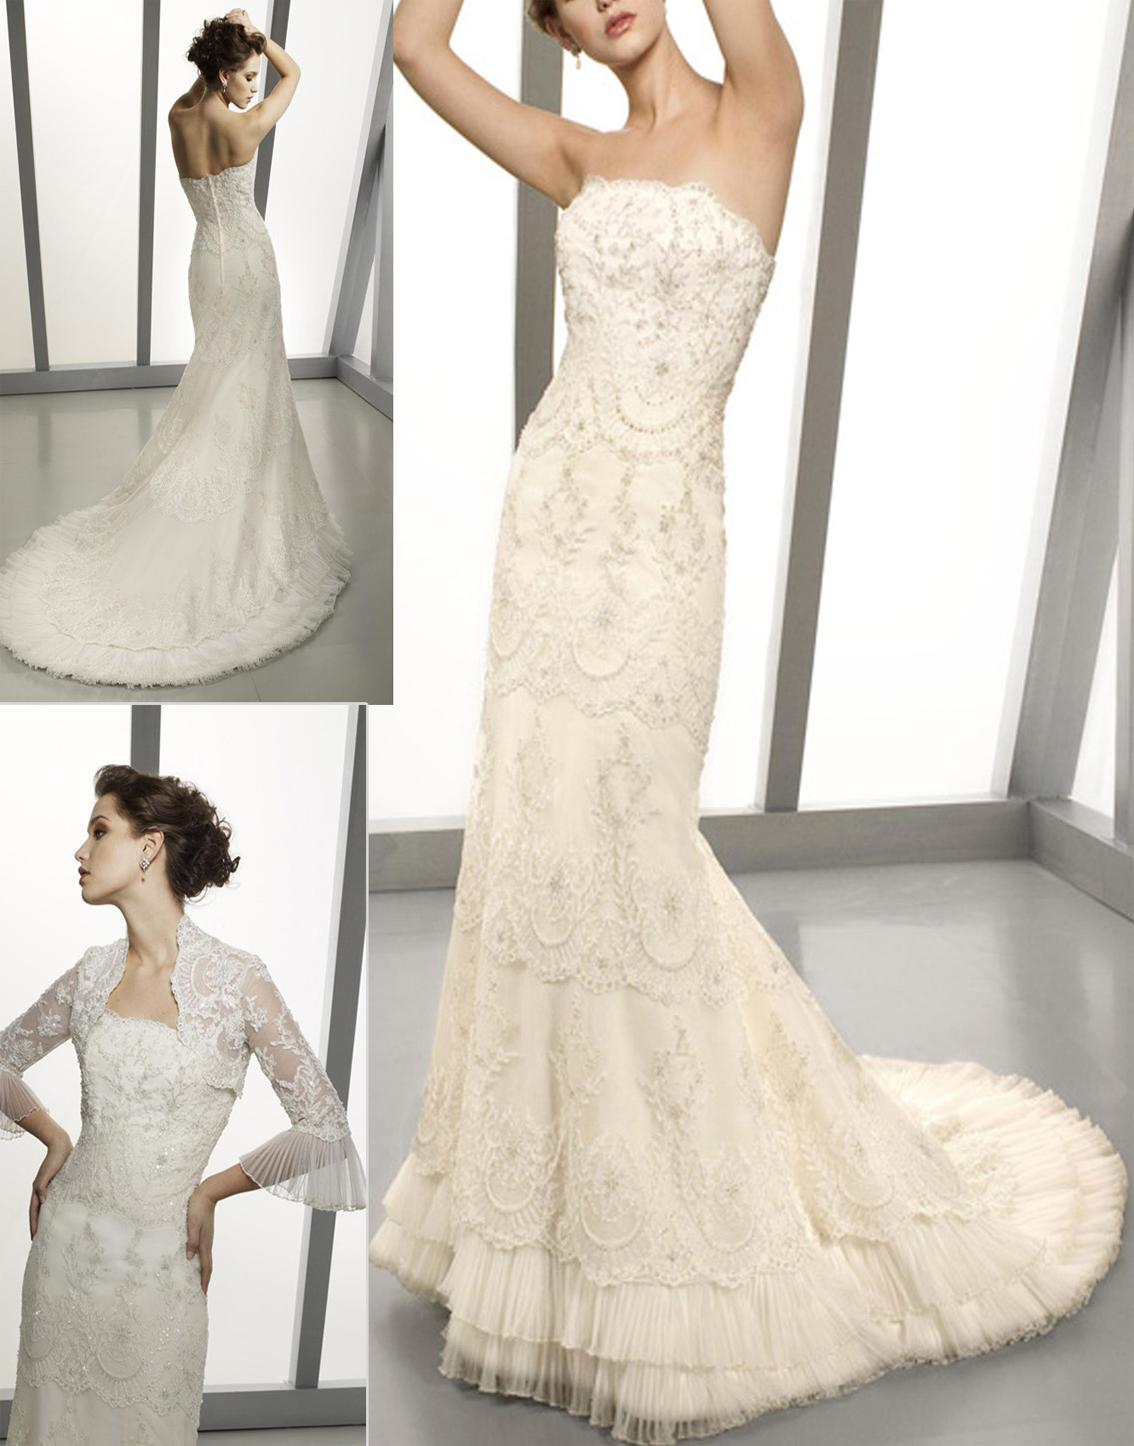 New Elegant Wedding Bridal Dress  Angela-155